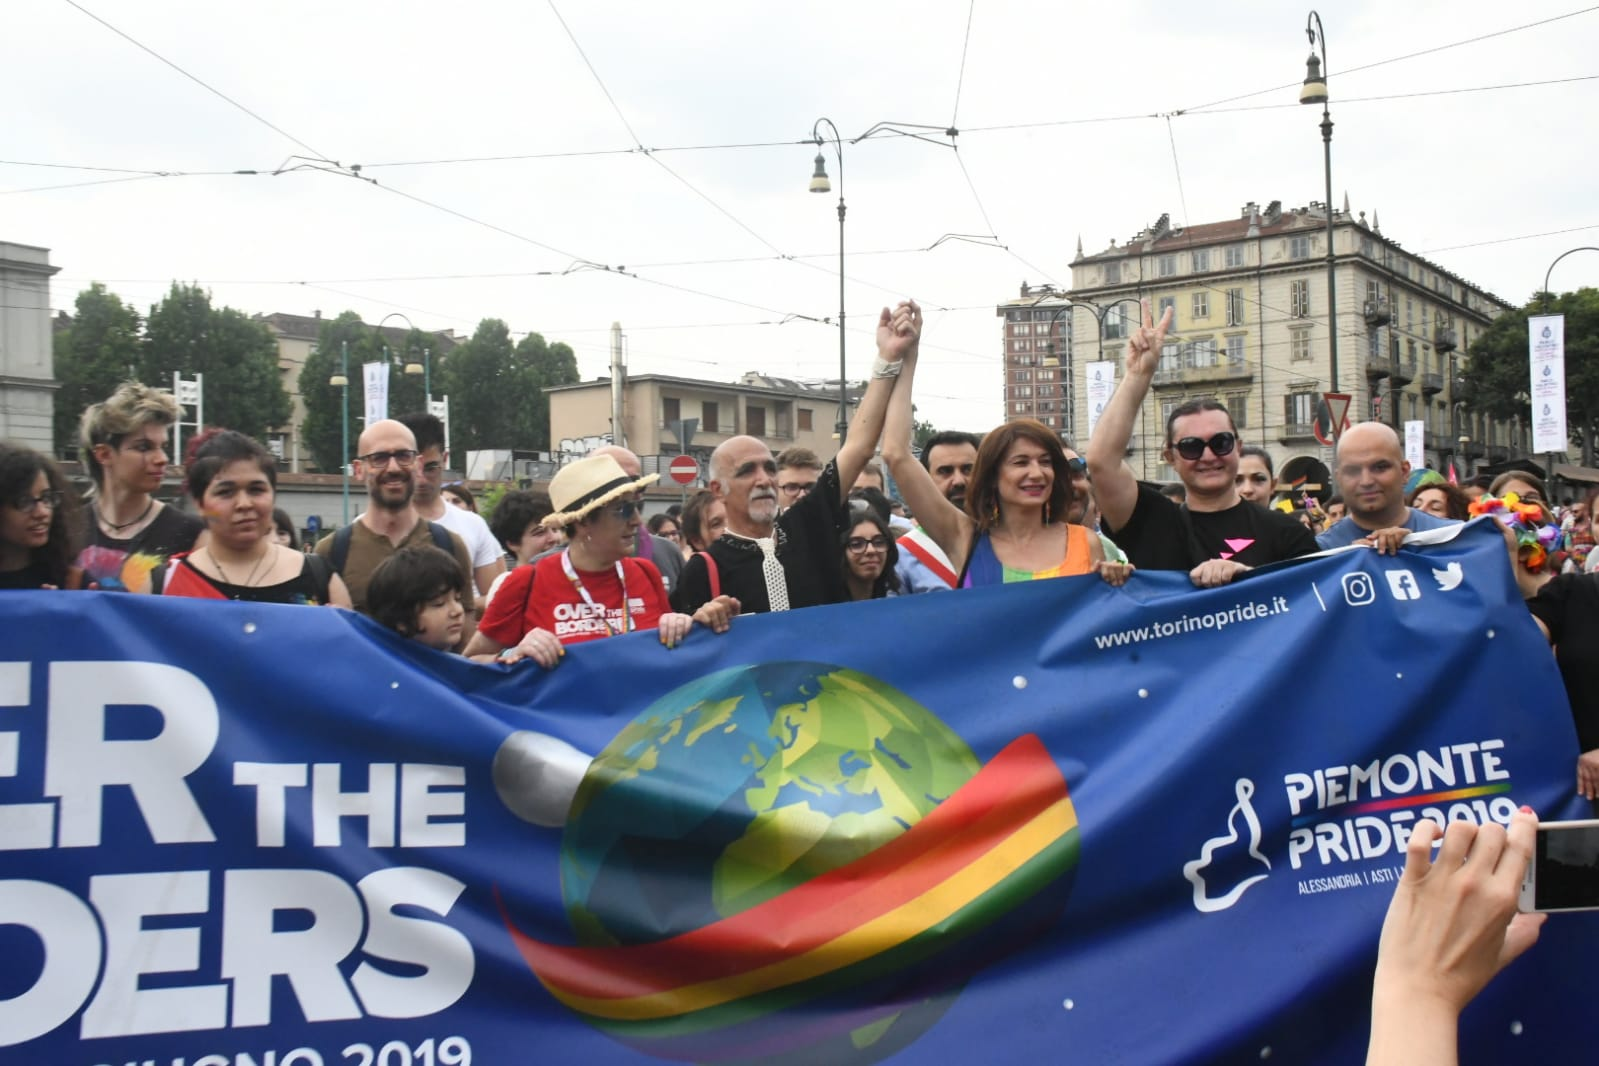 Torino Pride 2019 Diriti lgbt